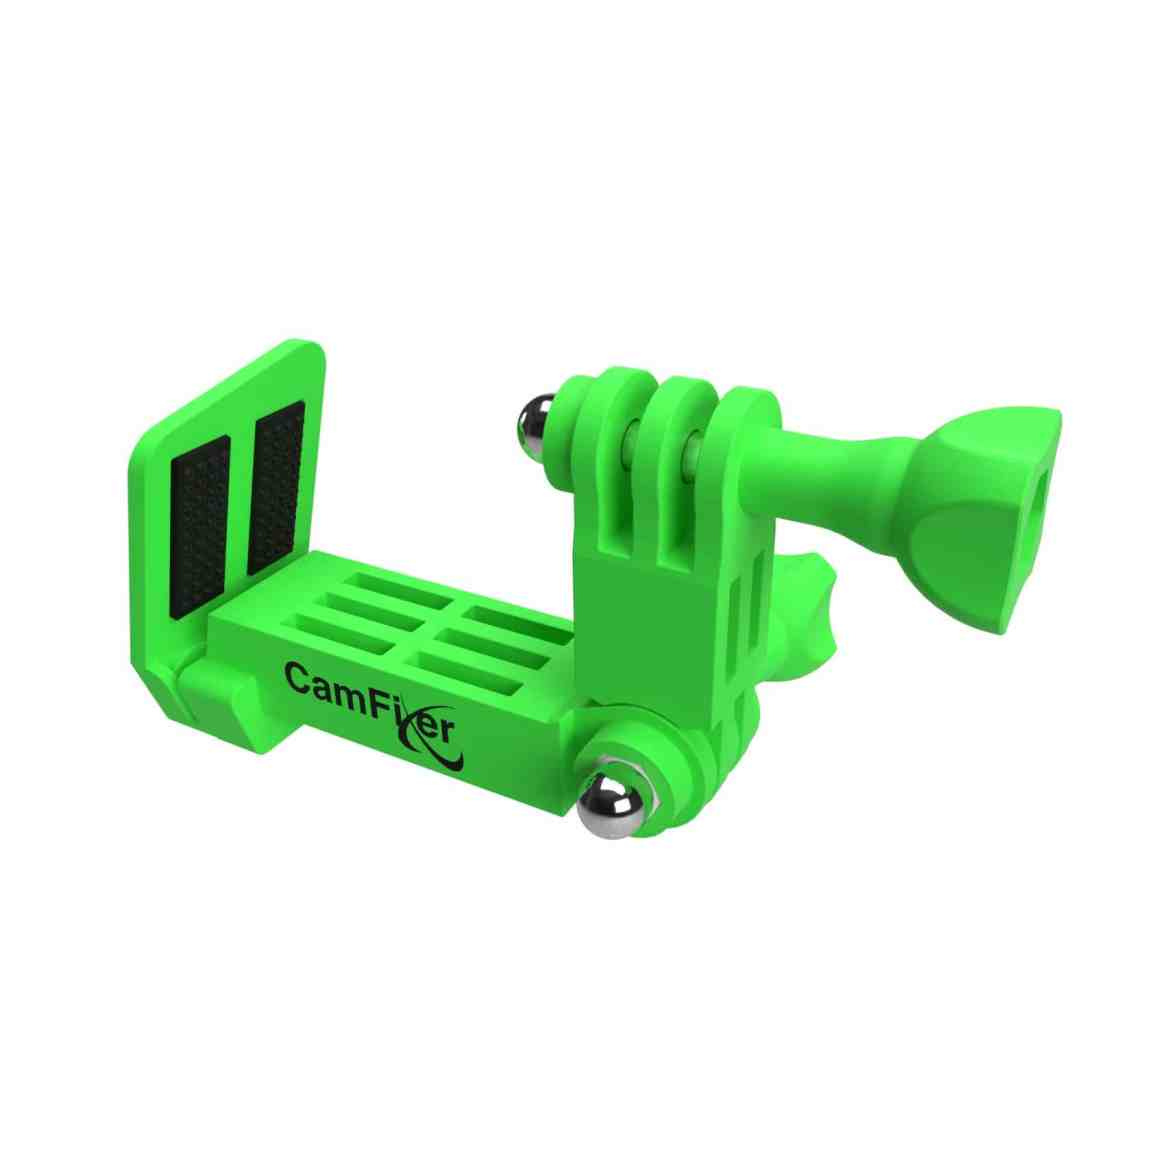 GoPro Green